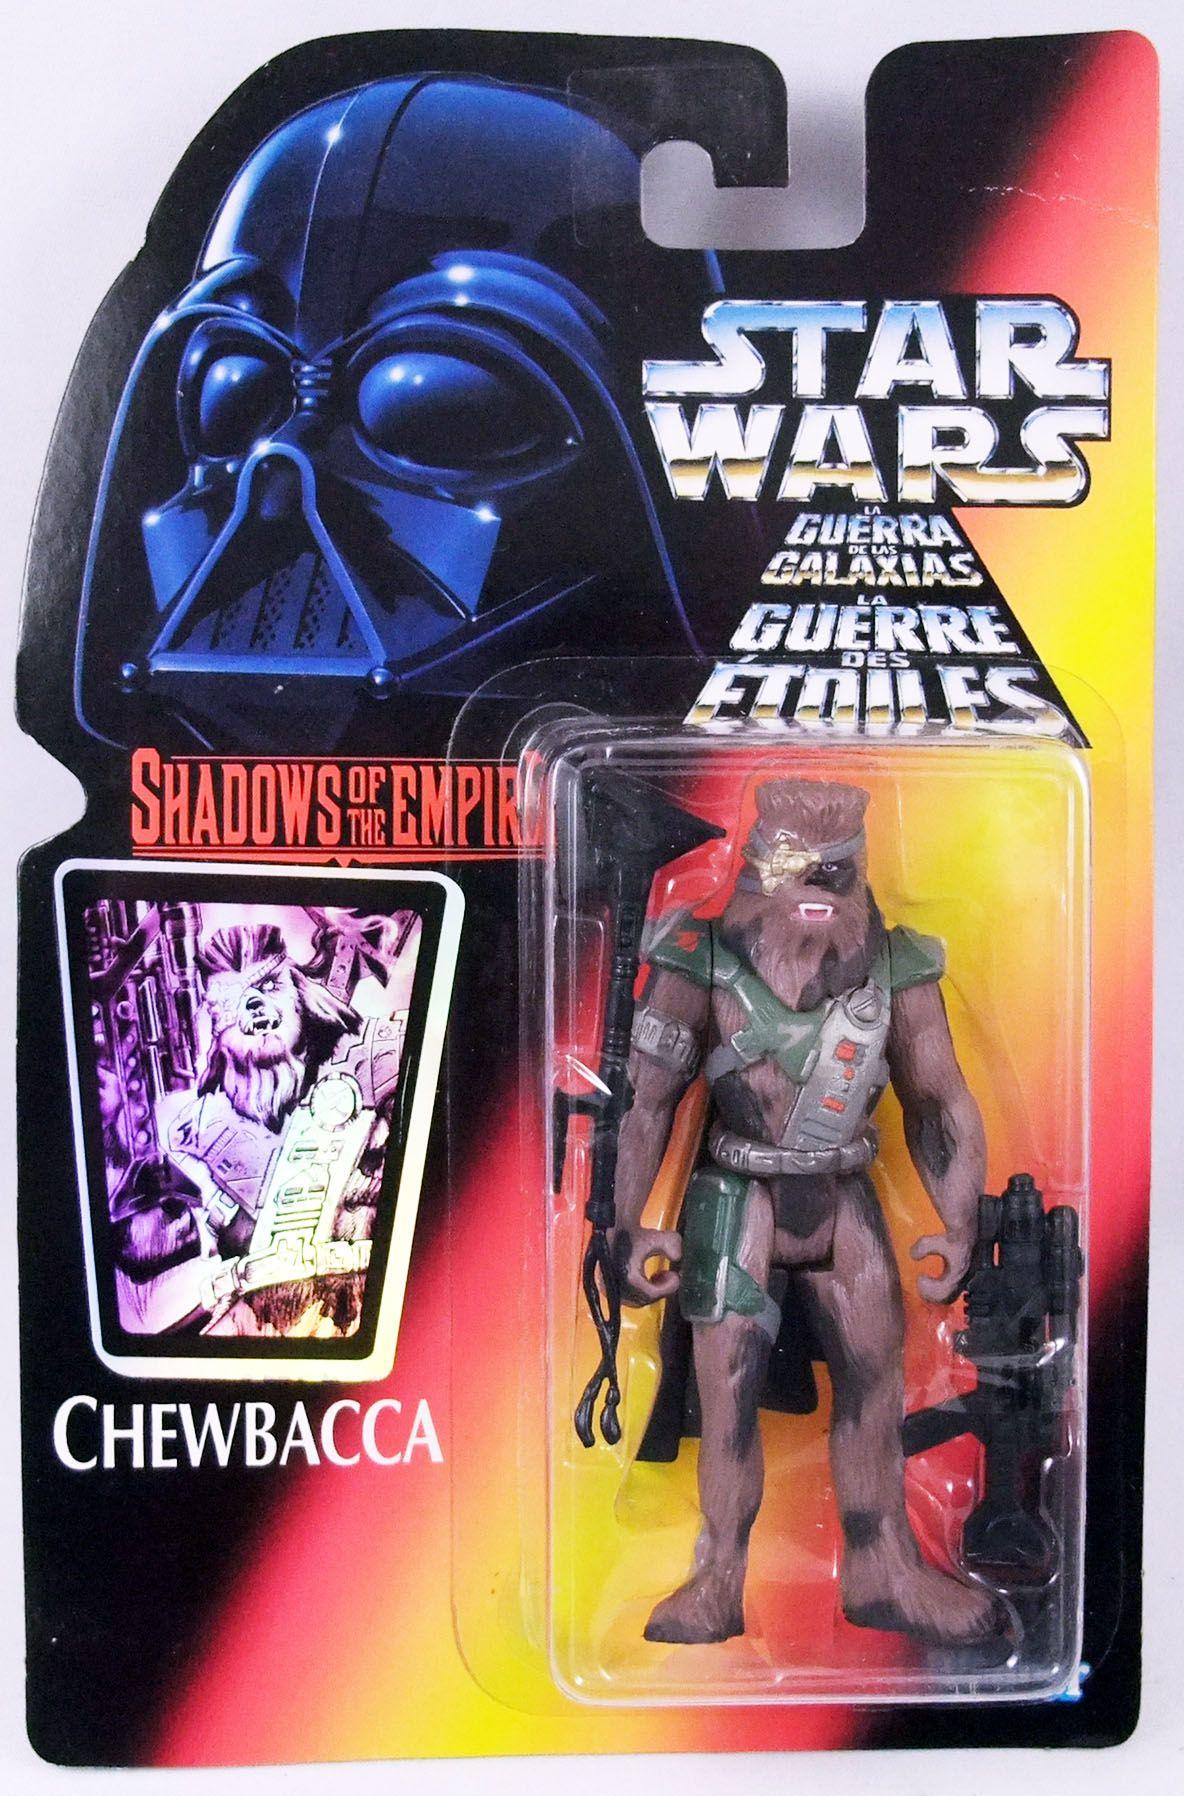 Star Wars (Shadows of the Empire) - Kenner - Chewbacca Snoova (Version Fr)